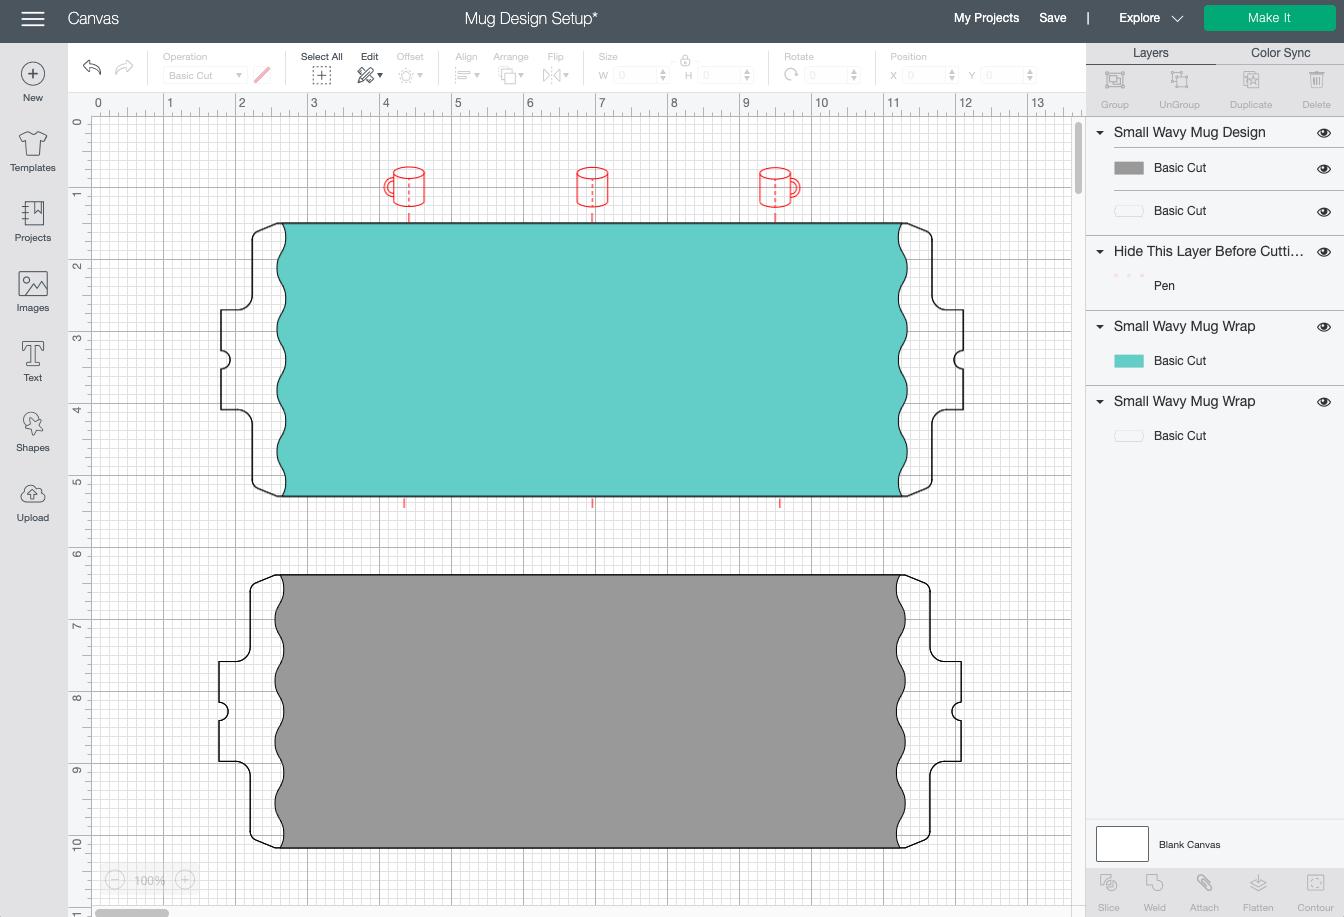 Cricut Design Space: Mug wrap template compared to mug wrap image from Cricut Image Library